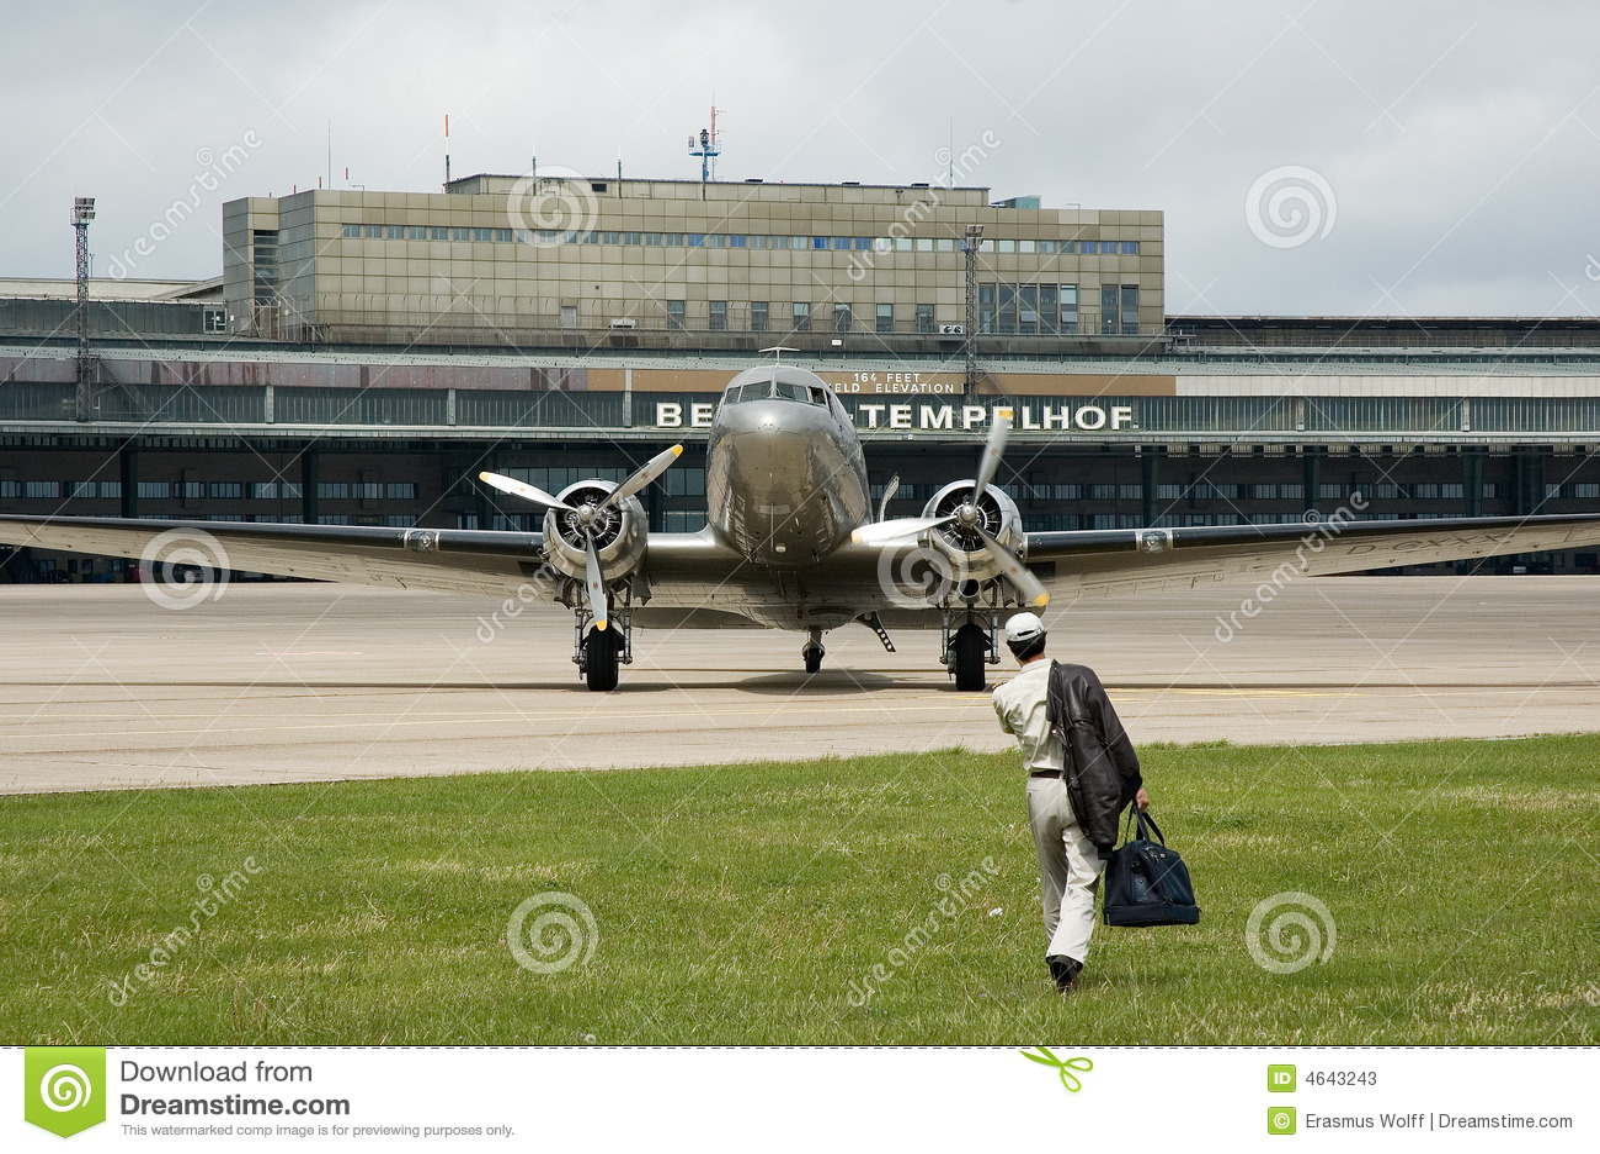 Aviões velhos em Berlim tempelhof